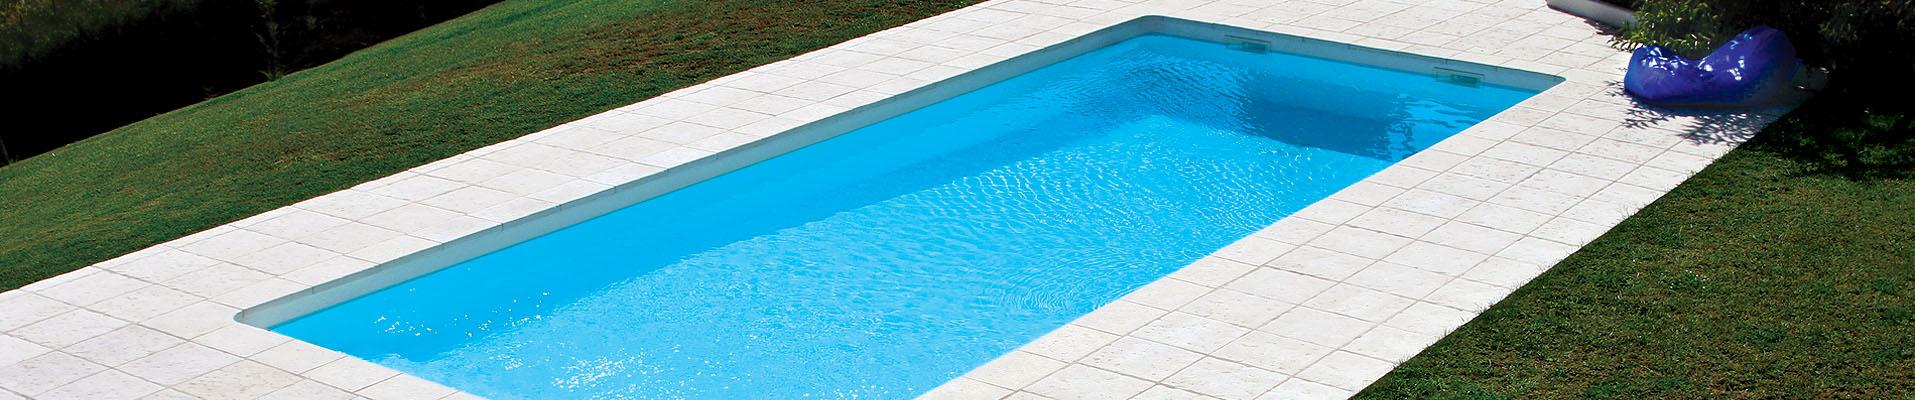 piscina_inoblock_bn_01